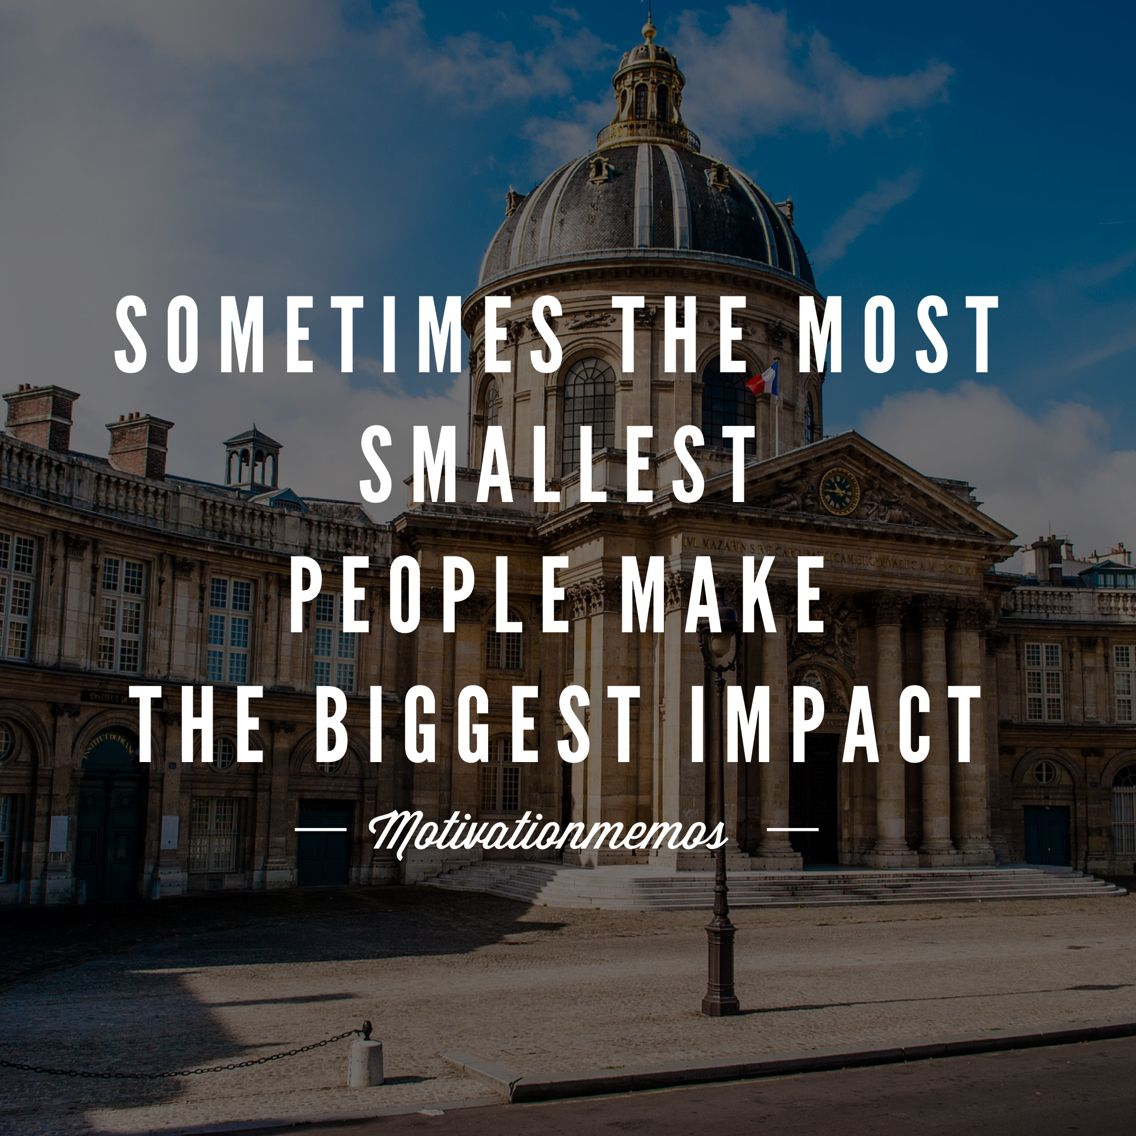 Motivation and inspiration Follow @motivationmemos            #likeforlike#photooftheday #amazing #like4like #look#picoftheday#motivationalquotes#success#millionaire#entrepreneur#business#motivation#motivationmemos#wealth#successquotes#goals#hustle#lawofsuccess#instagood #gold